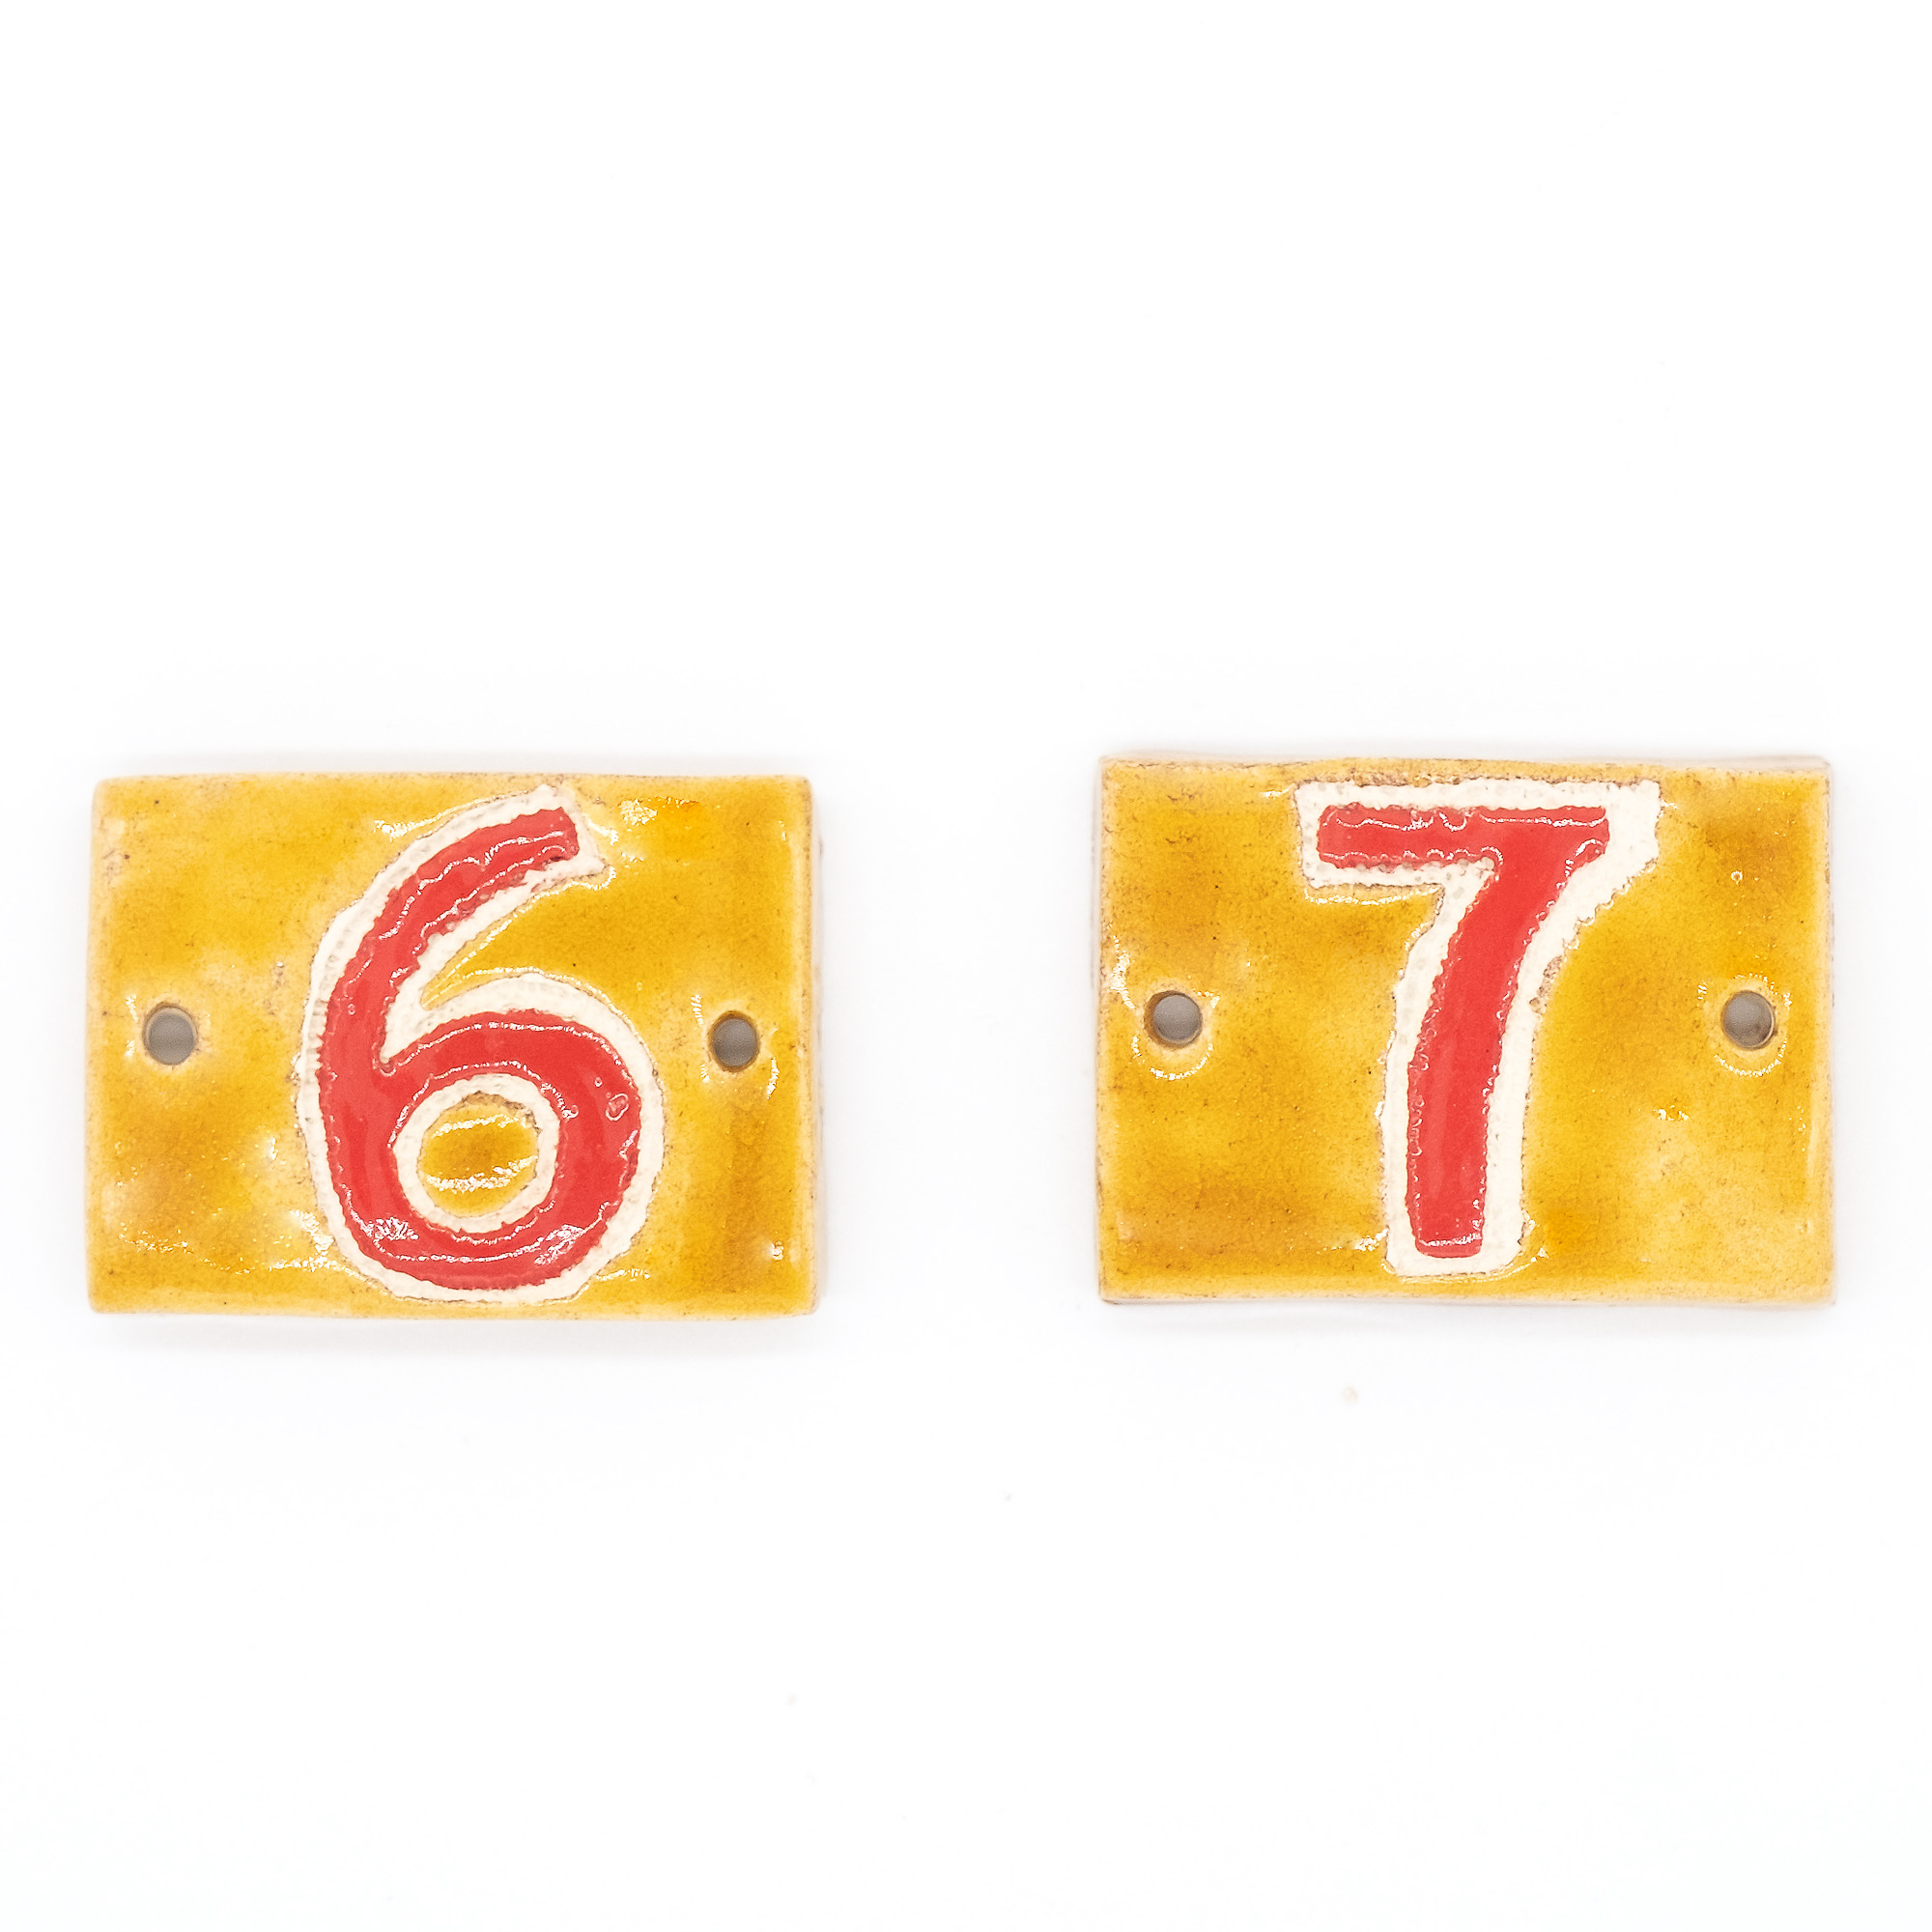 Piastrelle numeri civici - Stefania Mairano Creazioni in Ceramica